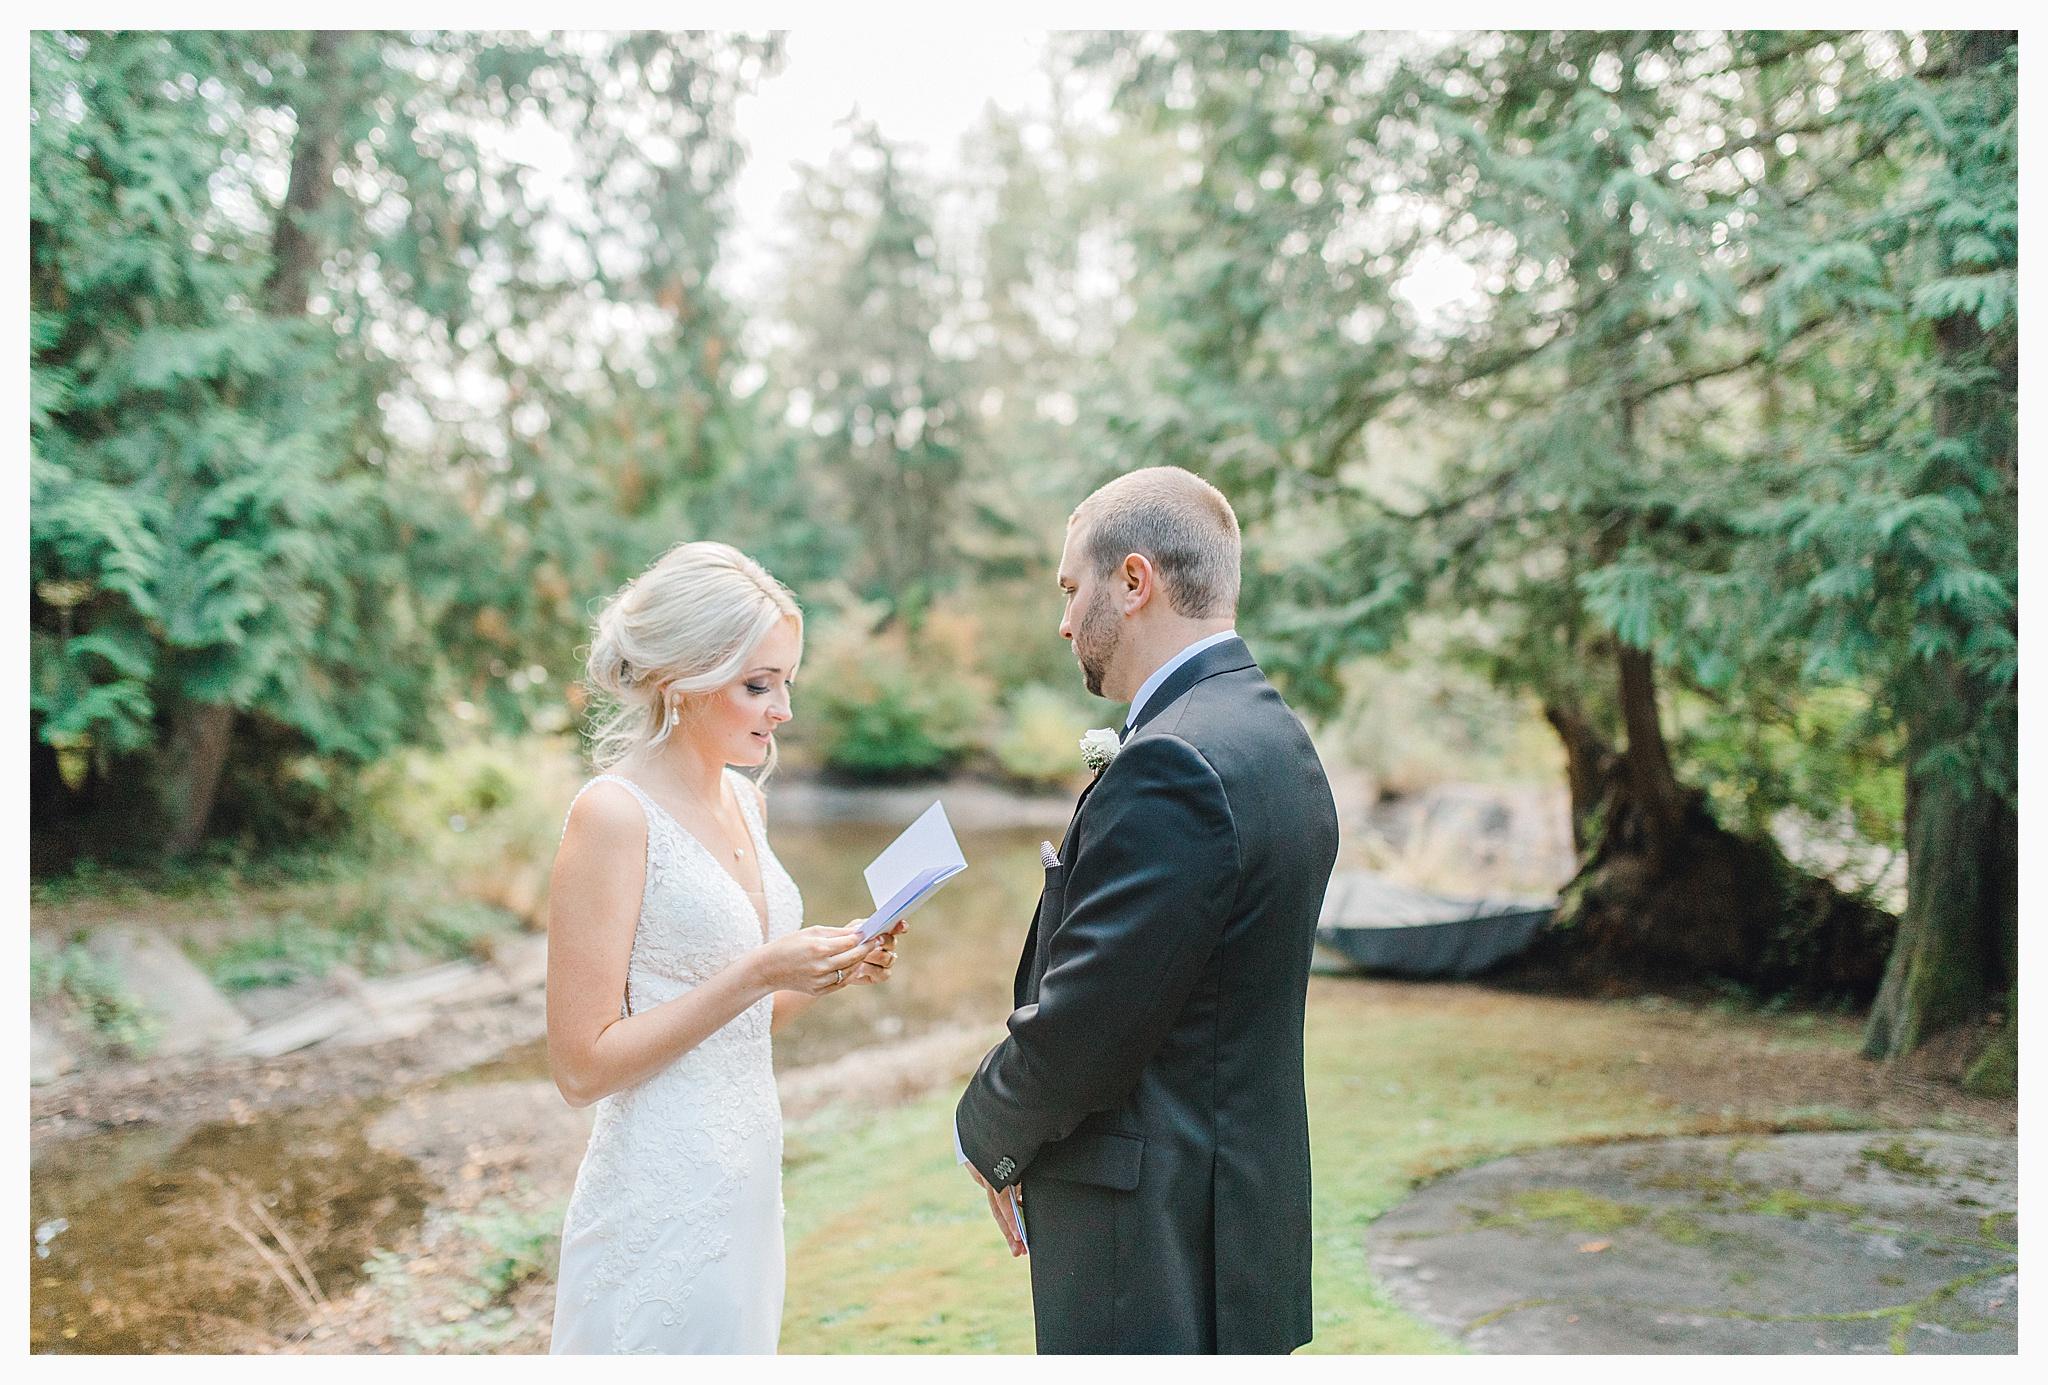 Emma Rose Company Light and Airy Wedding Photographer, Beautiful fall wedding at Rock Creek Gardens Venue in Puyallup, Washington._0024.jpg